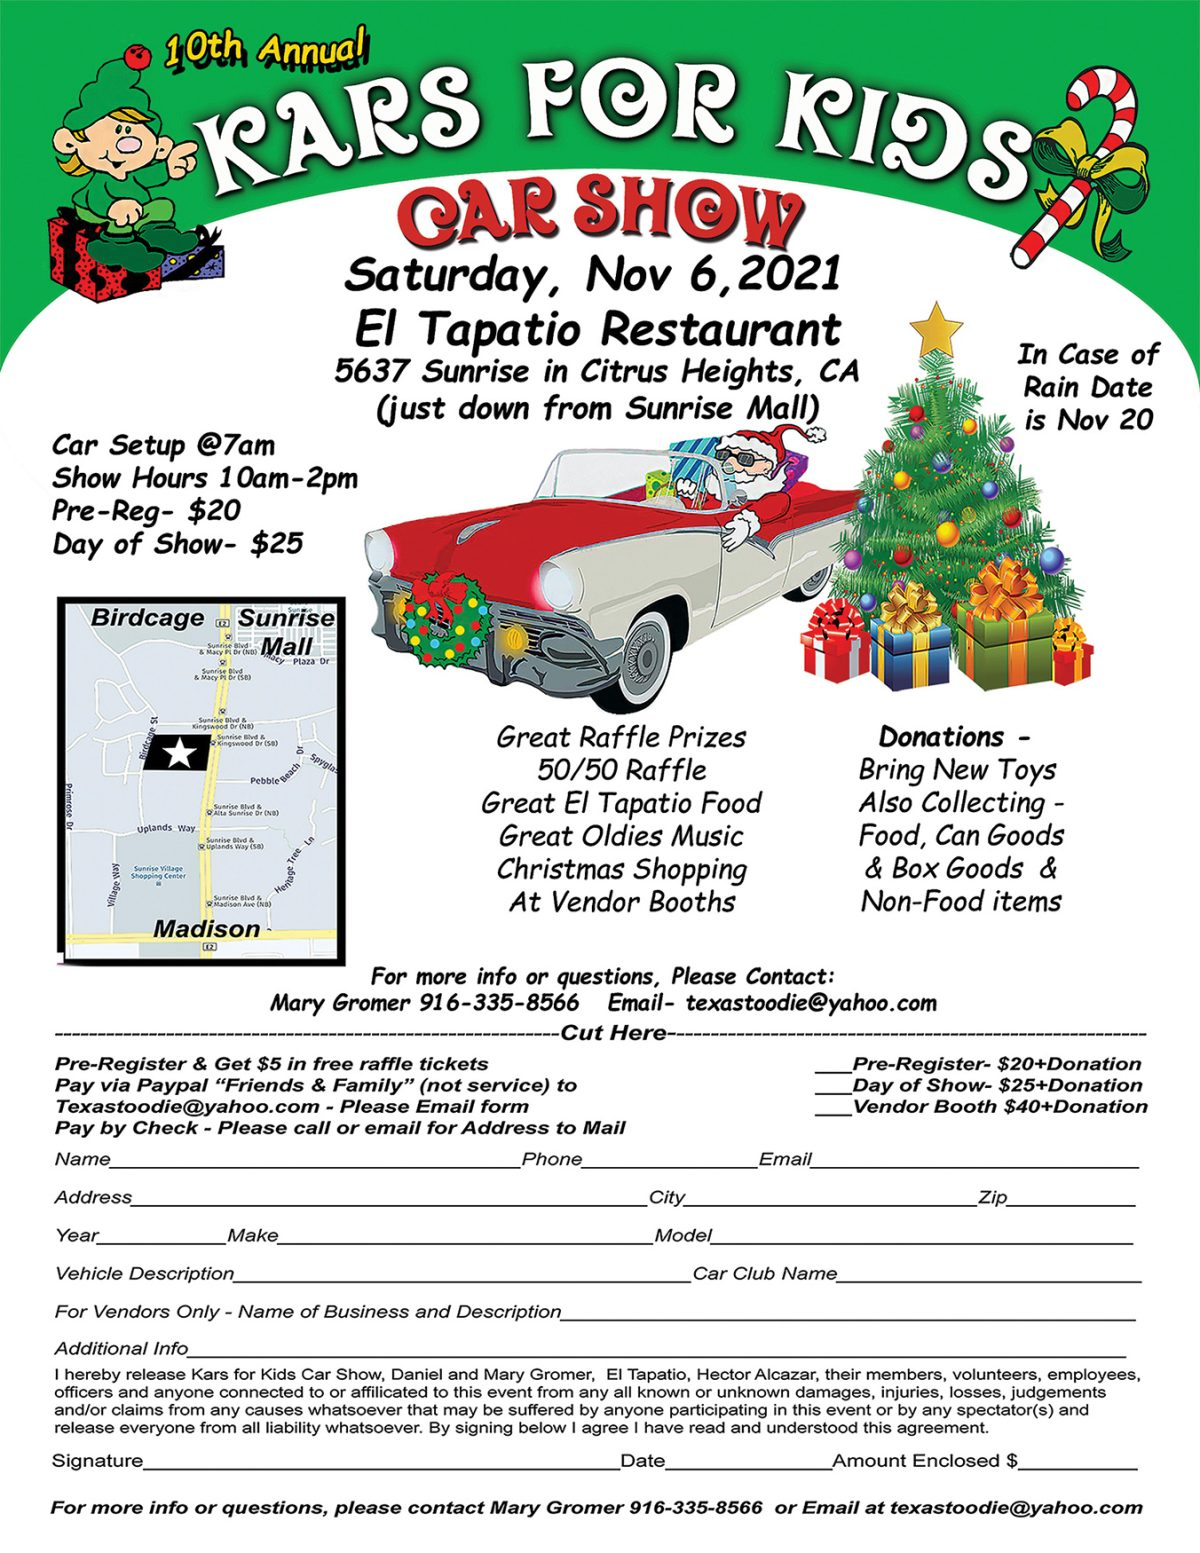 Kars for Kids Car Show